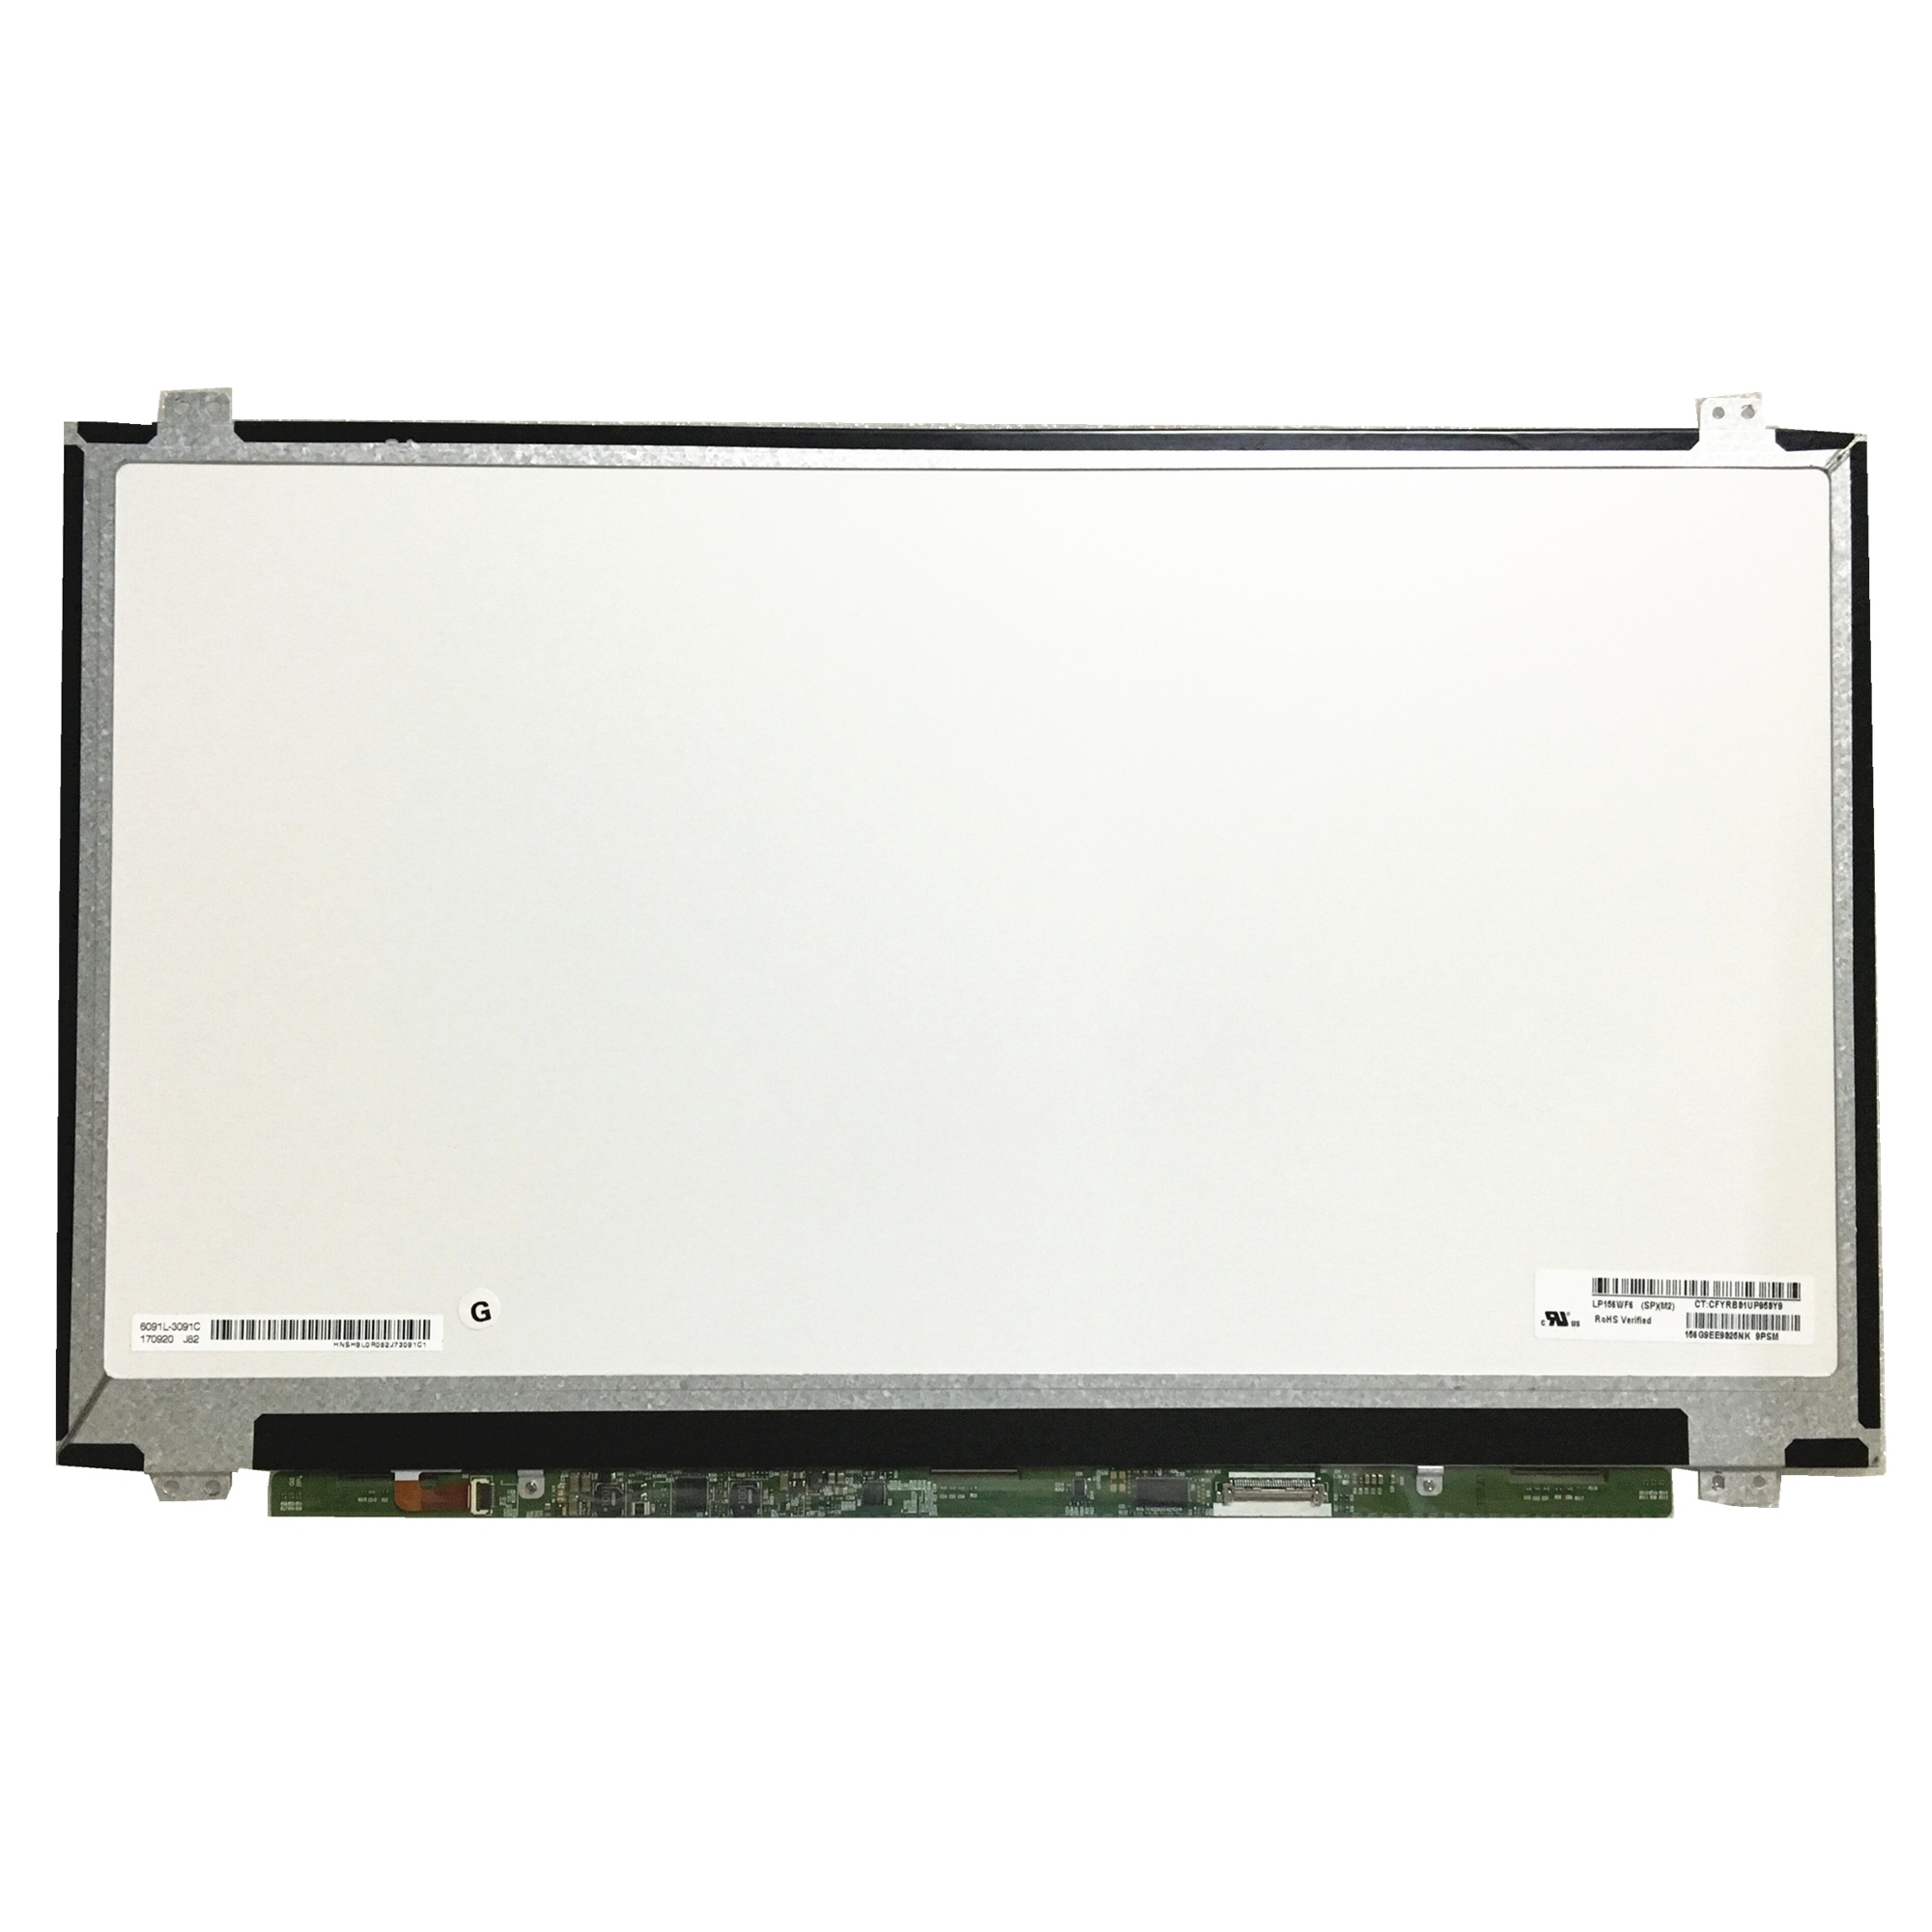 Free Shipping LP156WF6-SPM2 LP156WF6 SPM2 SPM3 SPM1 LP156WF6 SPP1 SPP2 LP156WF6 SPK1 Laptop Lcd Screen 1920*1080 EDP 30Pins IPS